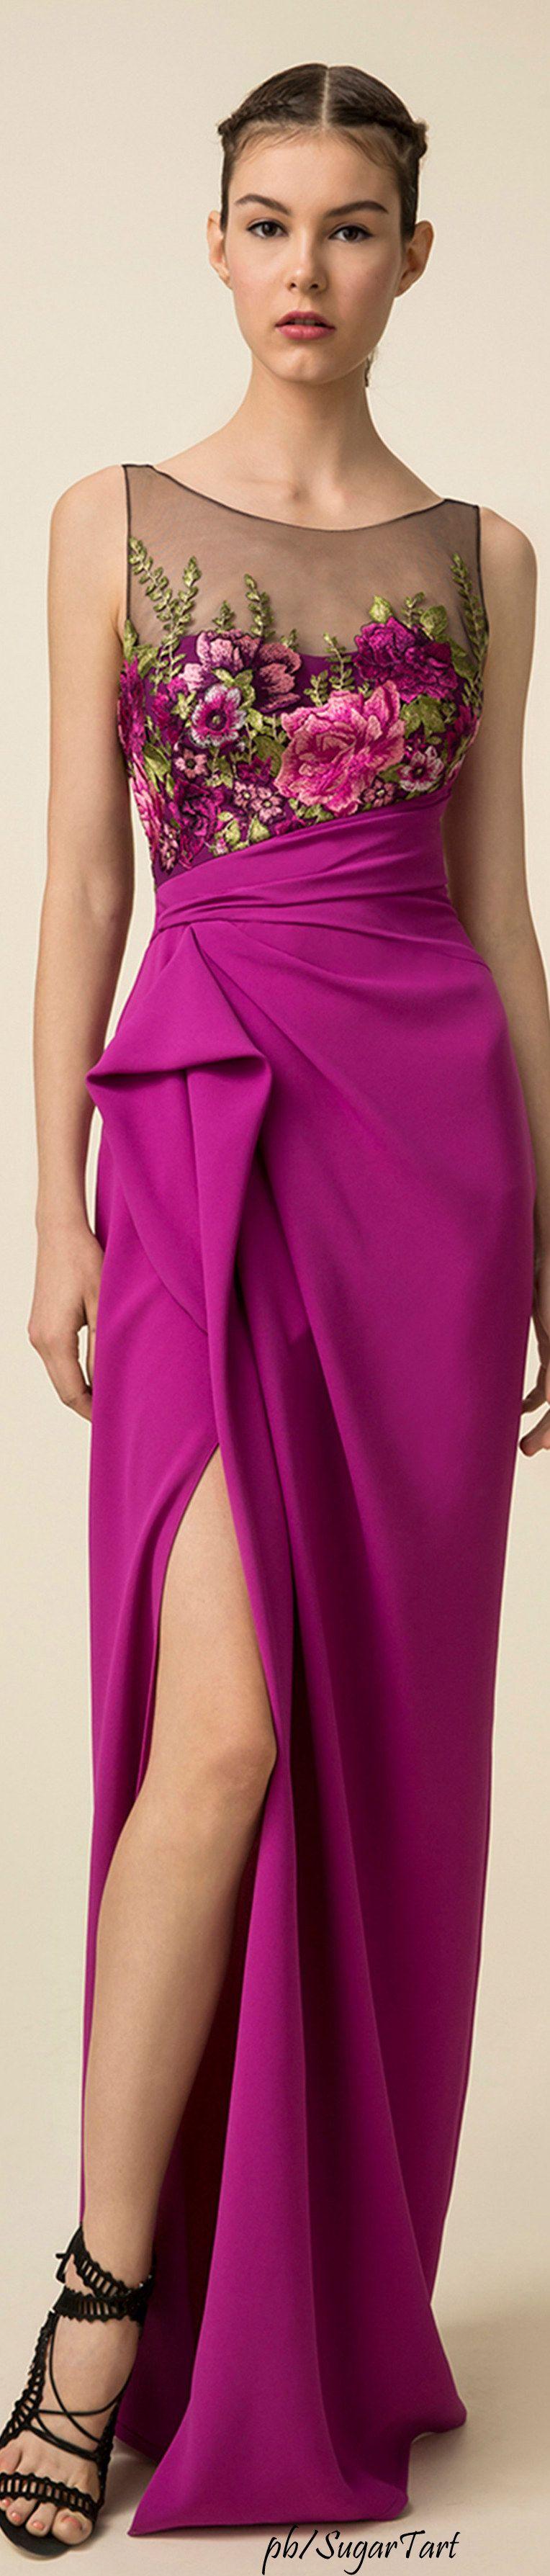 Marchesa Notte Spring 2016 RTW | Fabulous Fashion | Pinterest ...